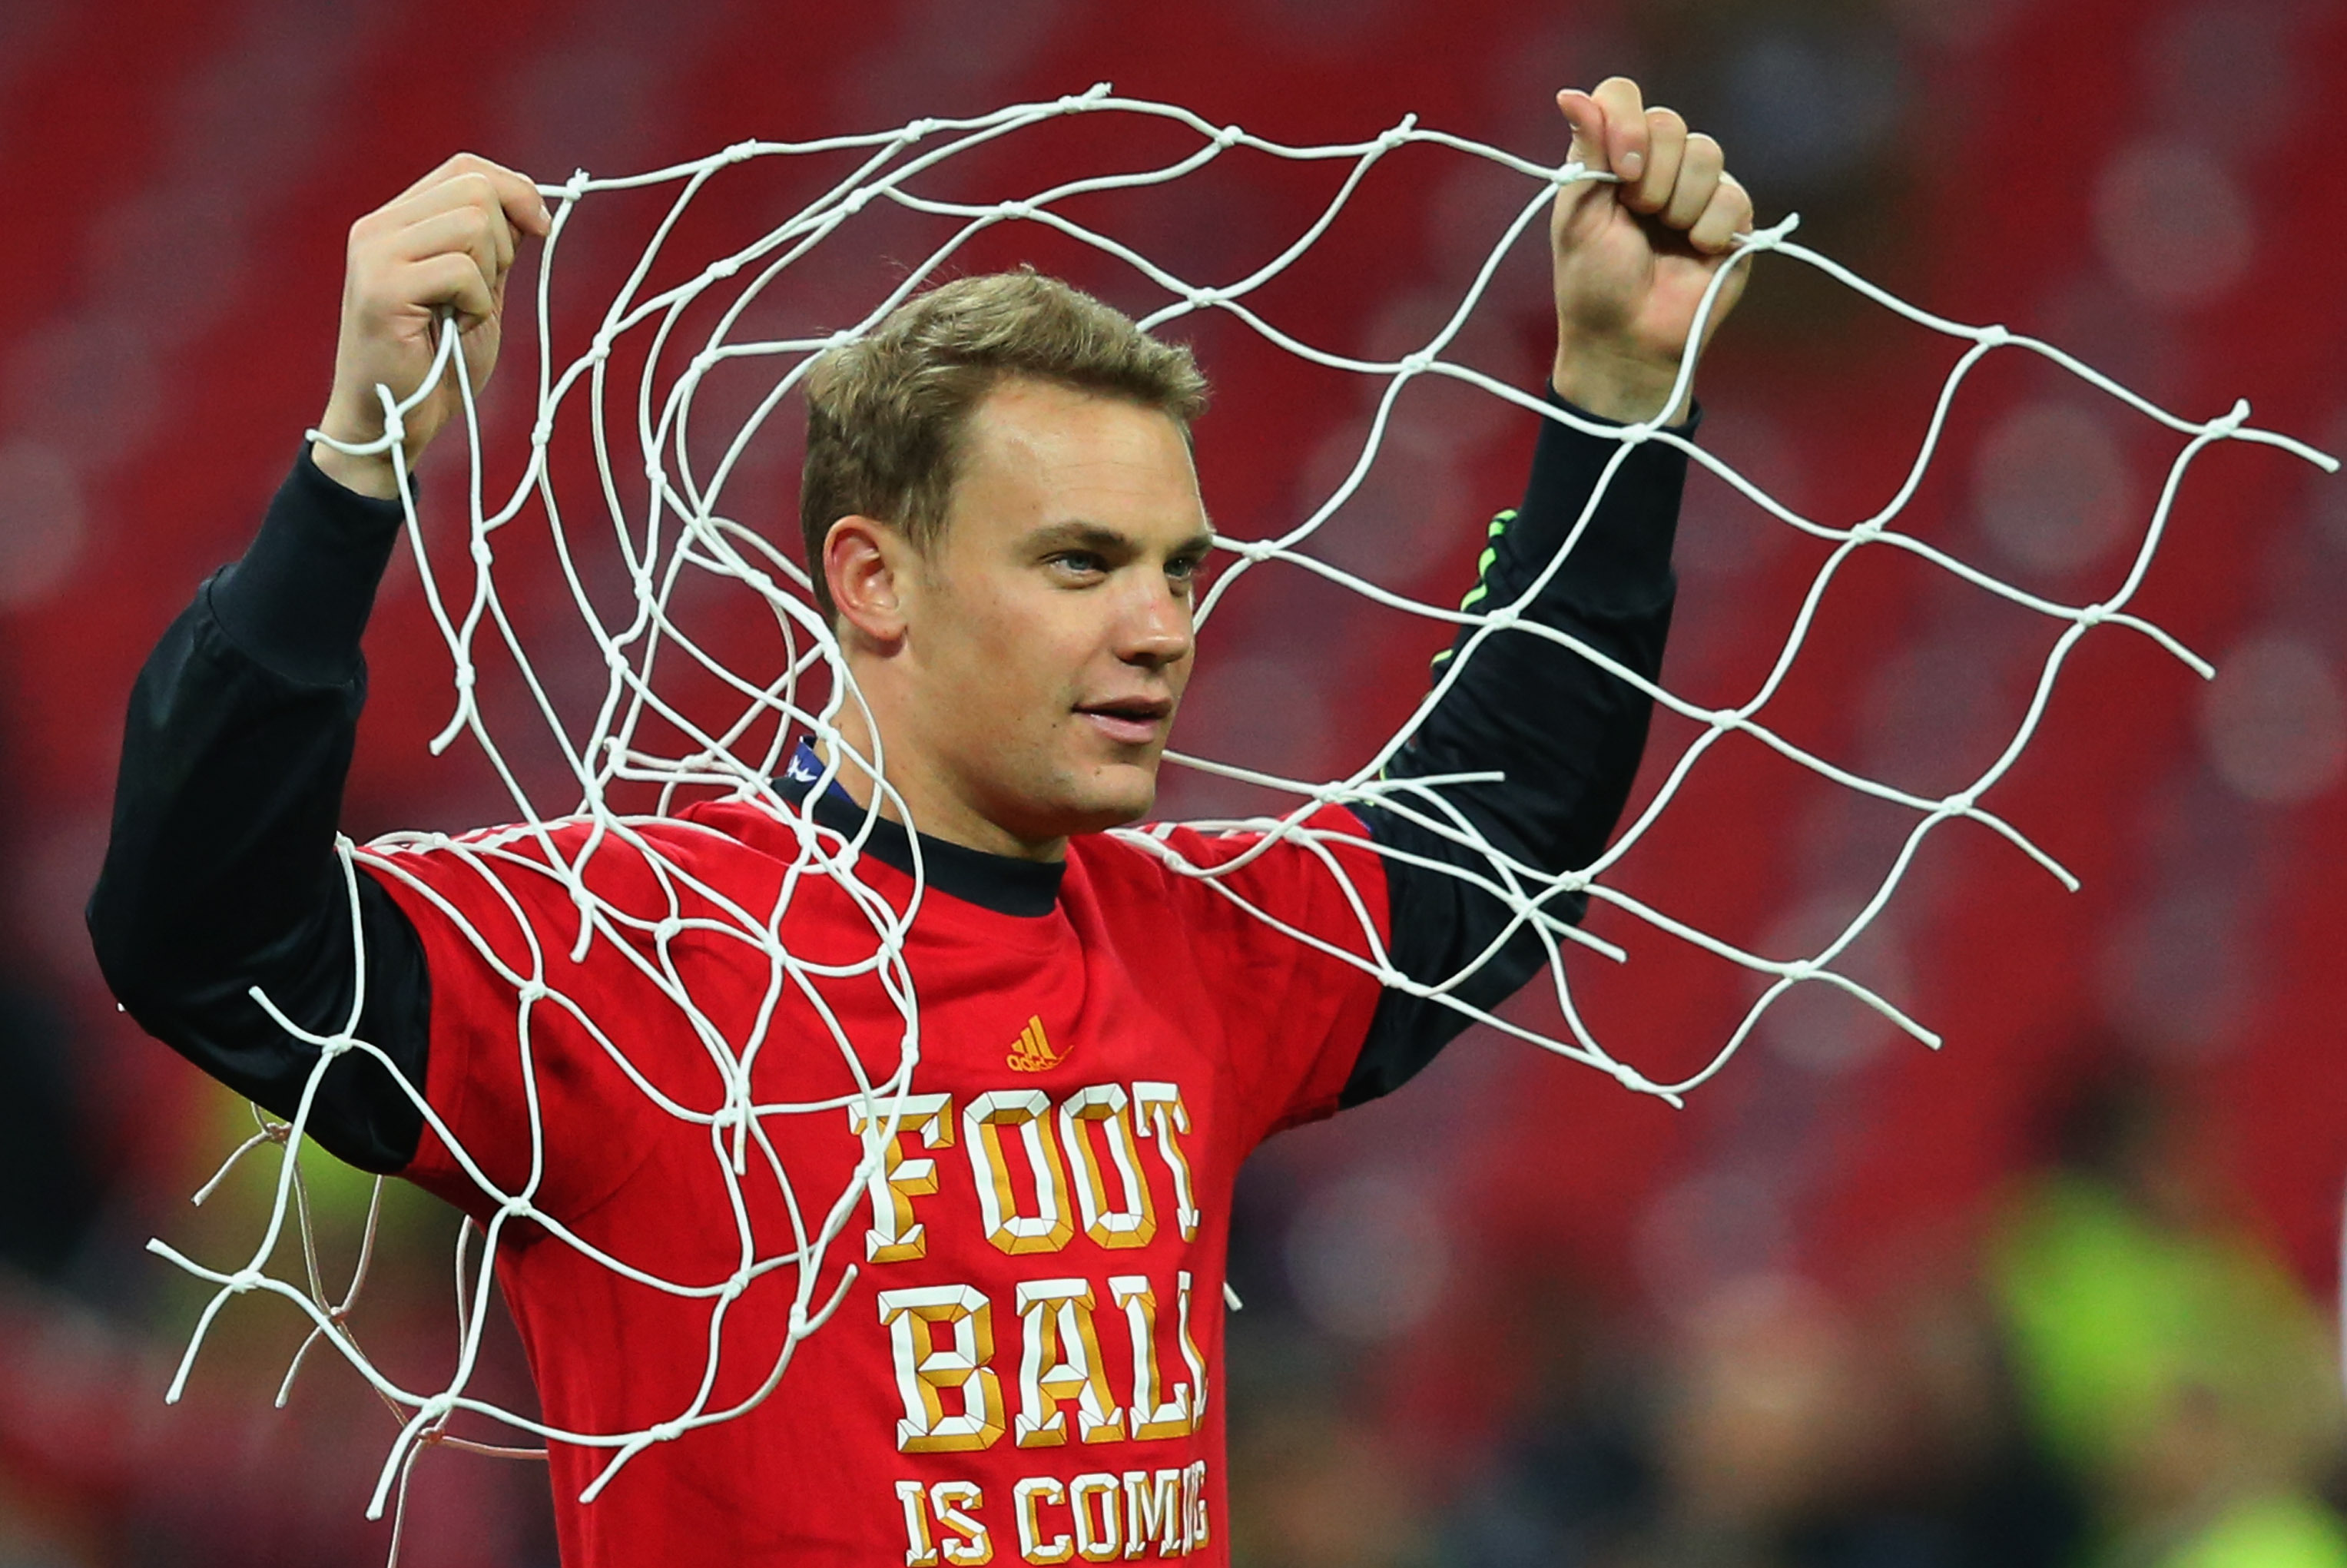 Champions League Final 2013: Manuel Neuer Was Biggest Winner After ...